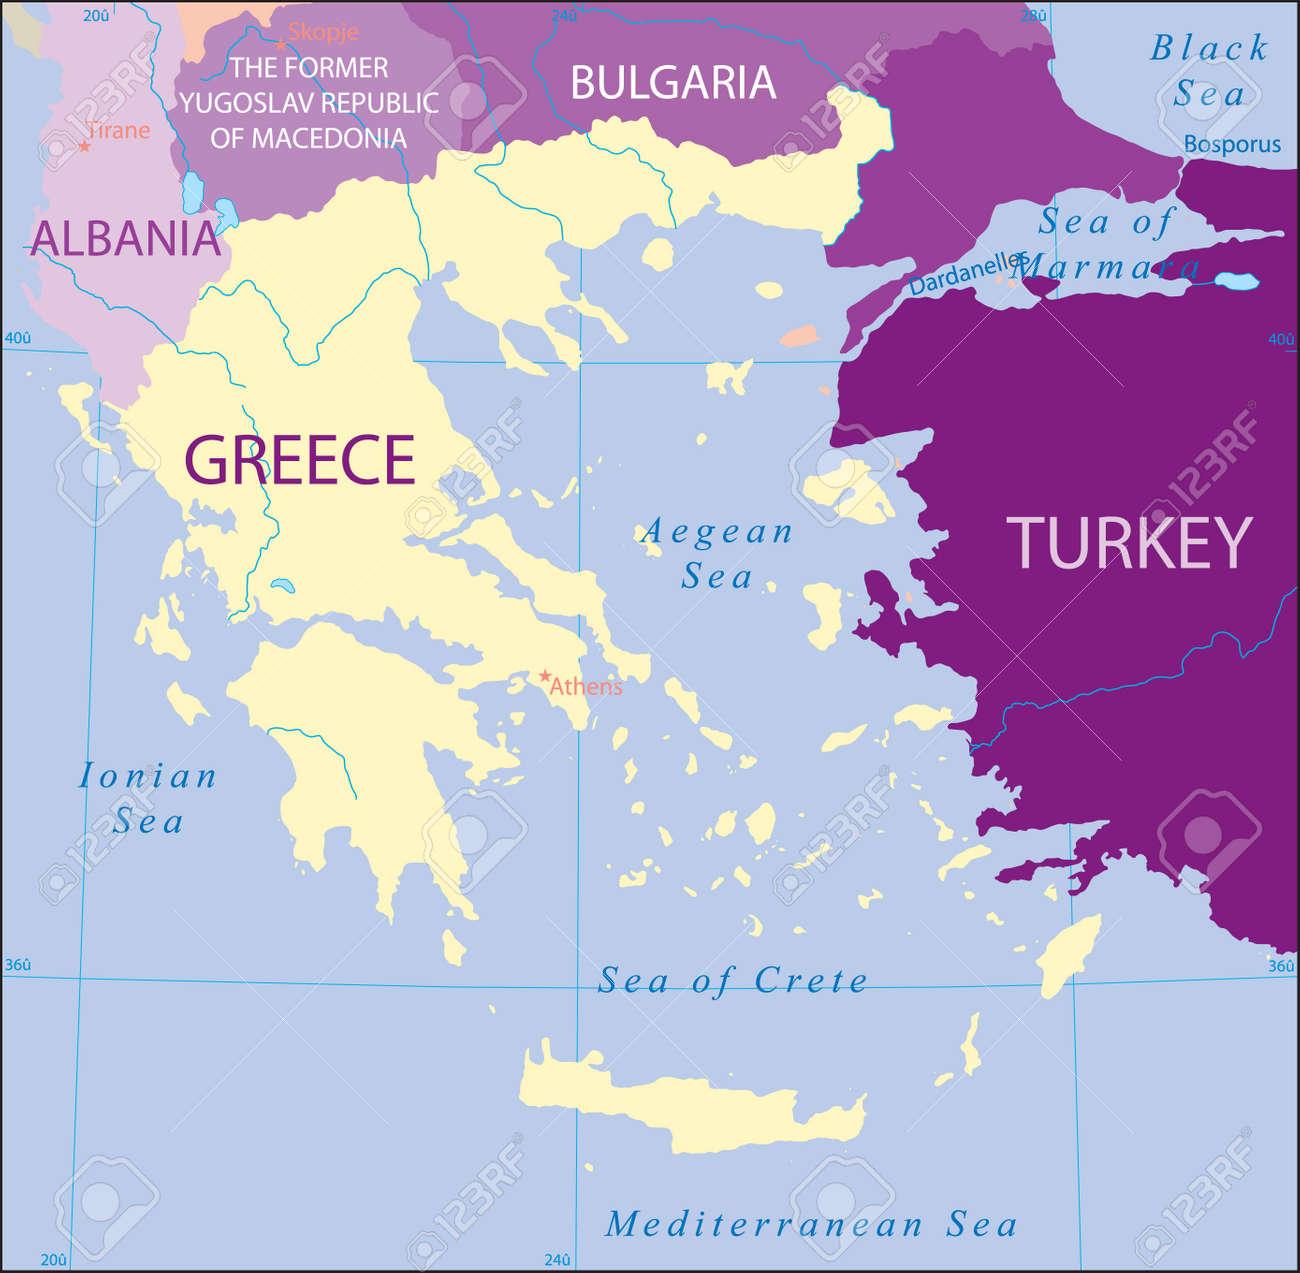 Albanija kupuje turske dronove 3941442-greece-turkey-albania-bulgaria-macedonia-map